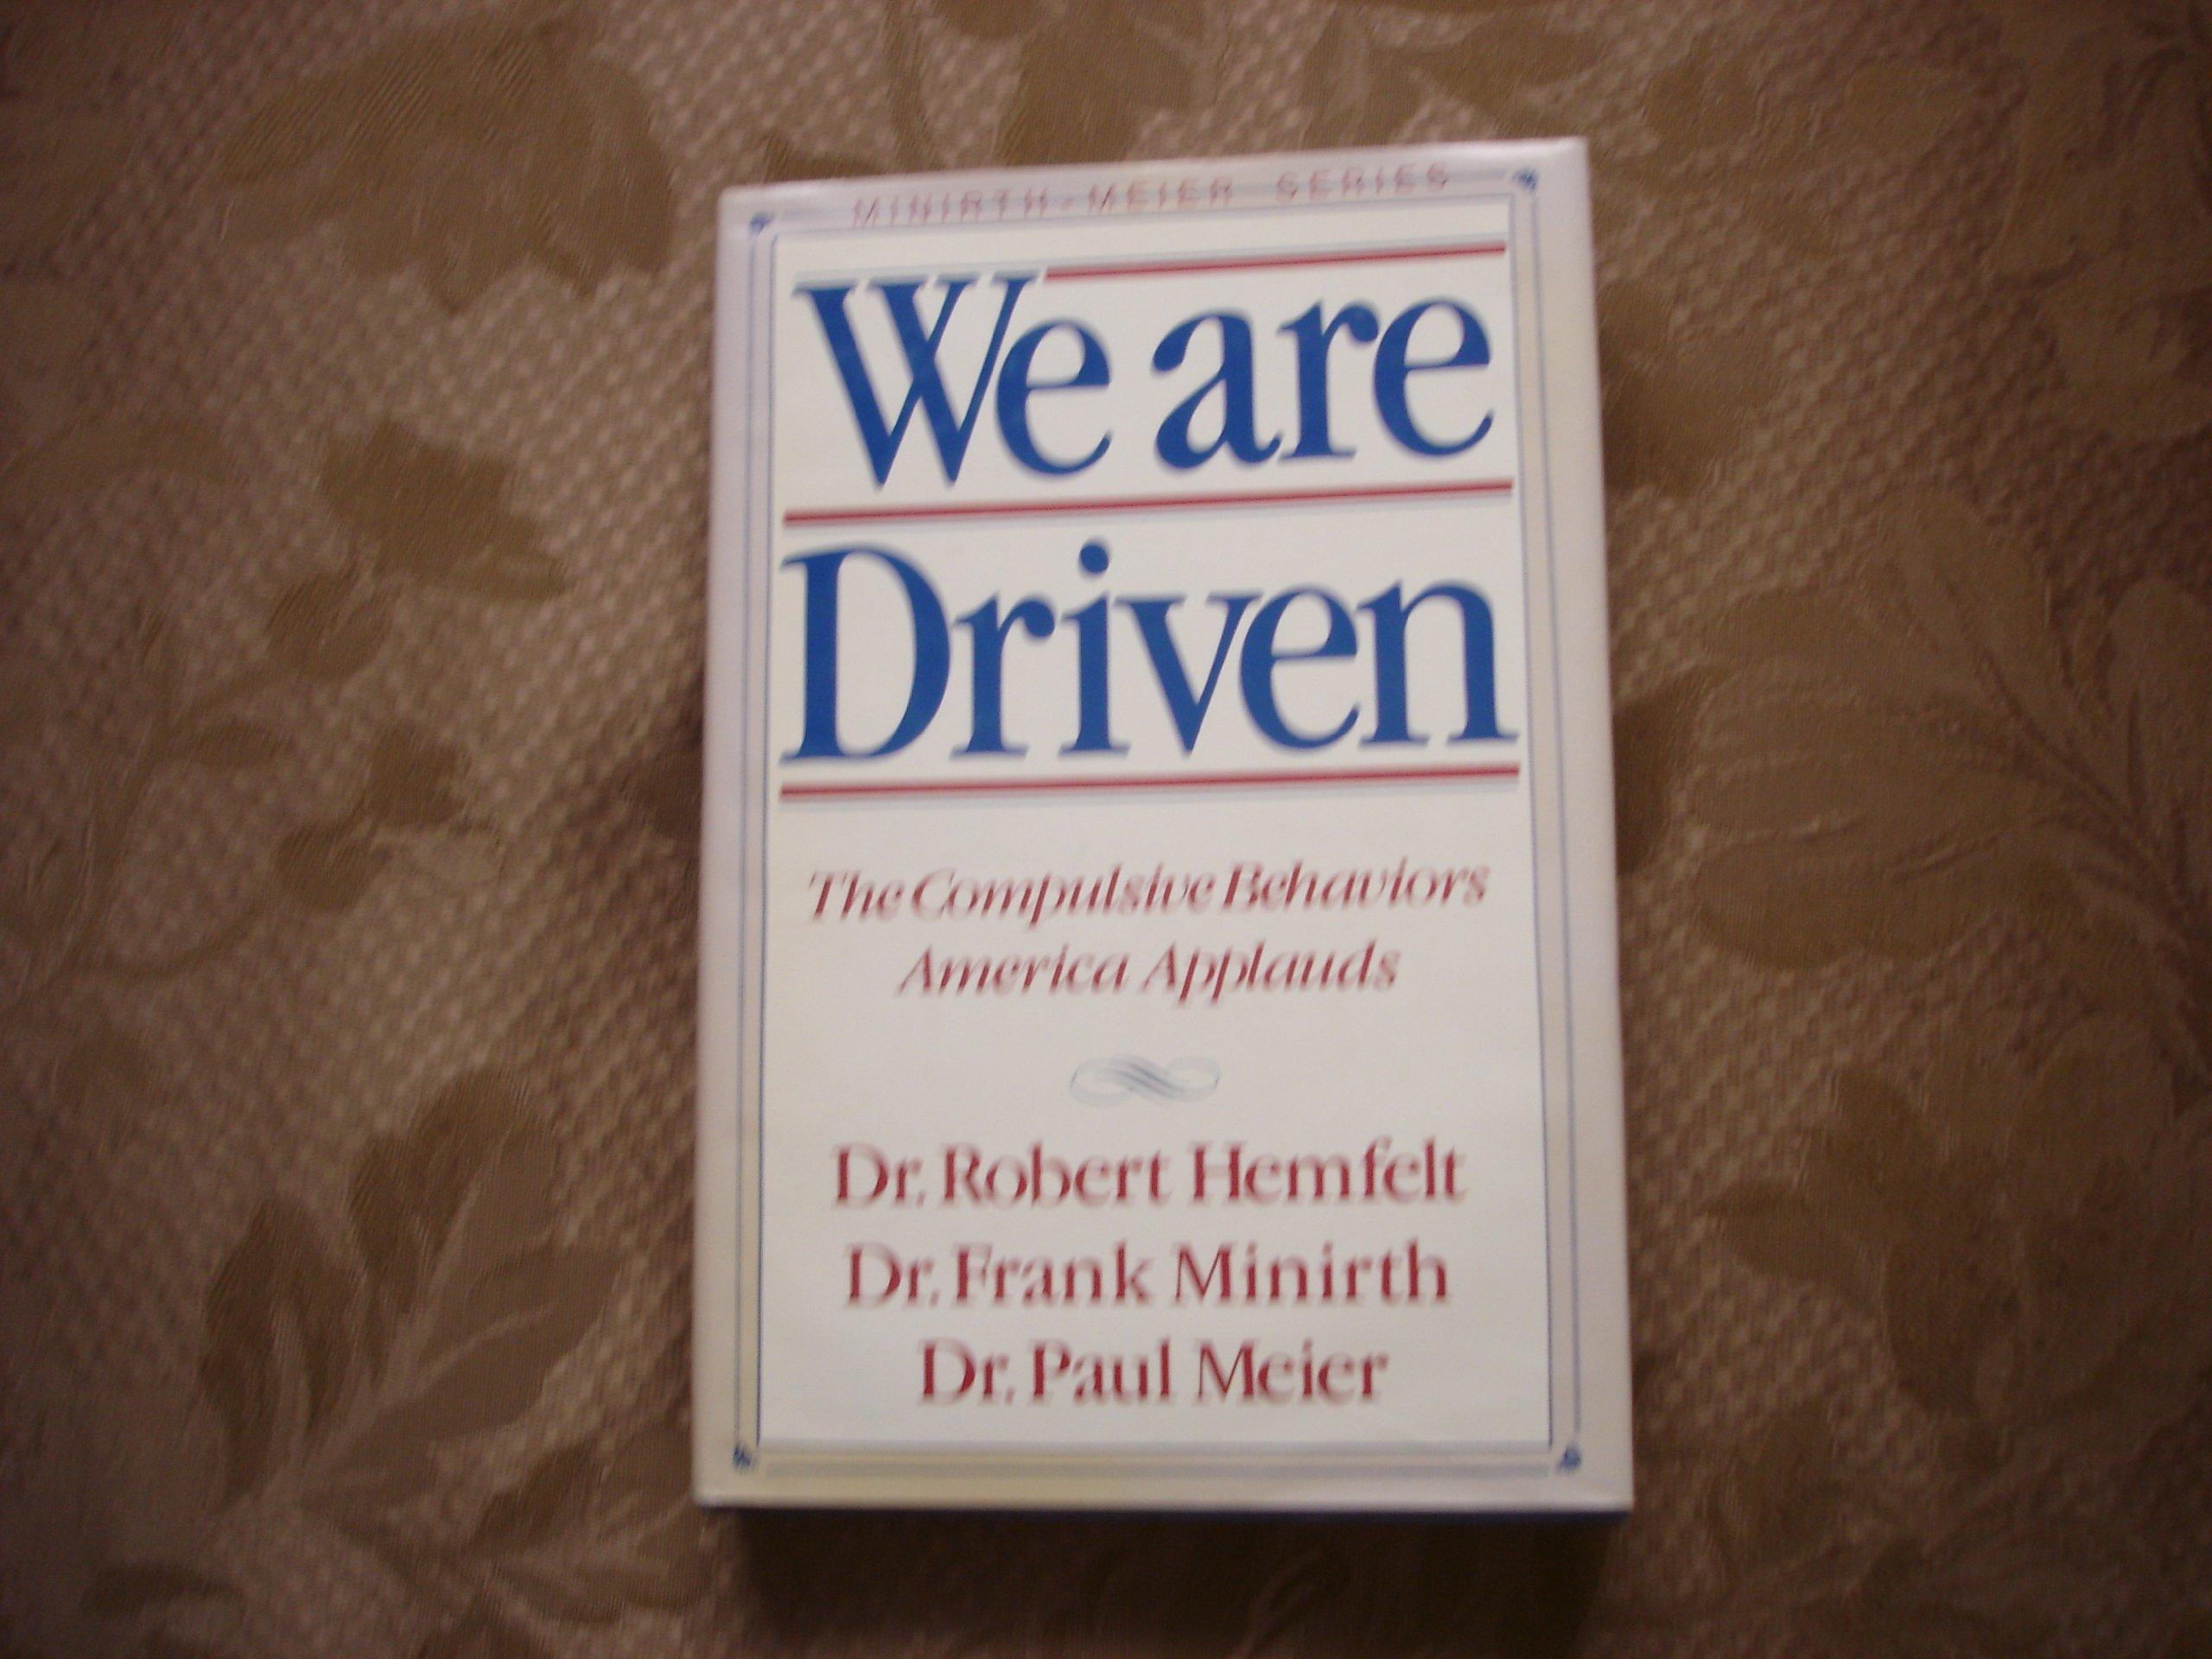 We Are Driven: The Compulsive Behaviors America Applauds: Robert Hemfelt,  Frank Minirth, Paul Meier: 9780840770714: Books - Amazon.ca